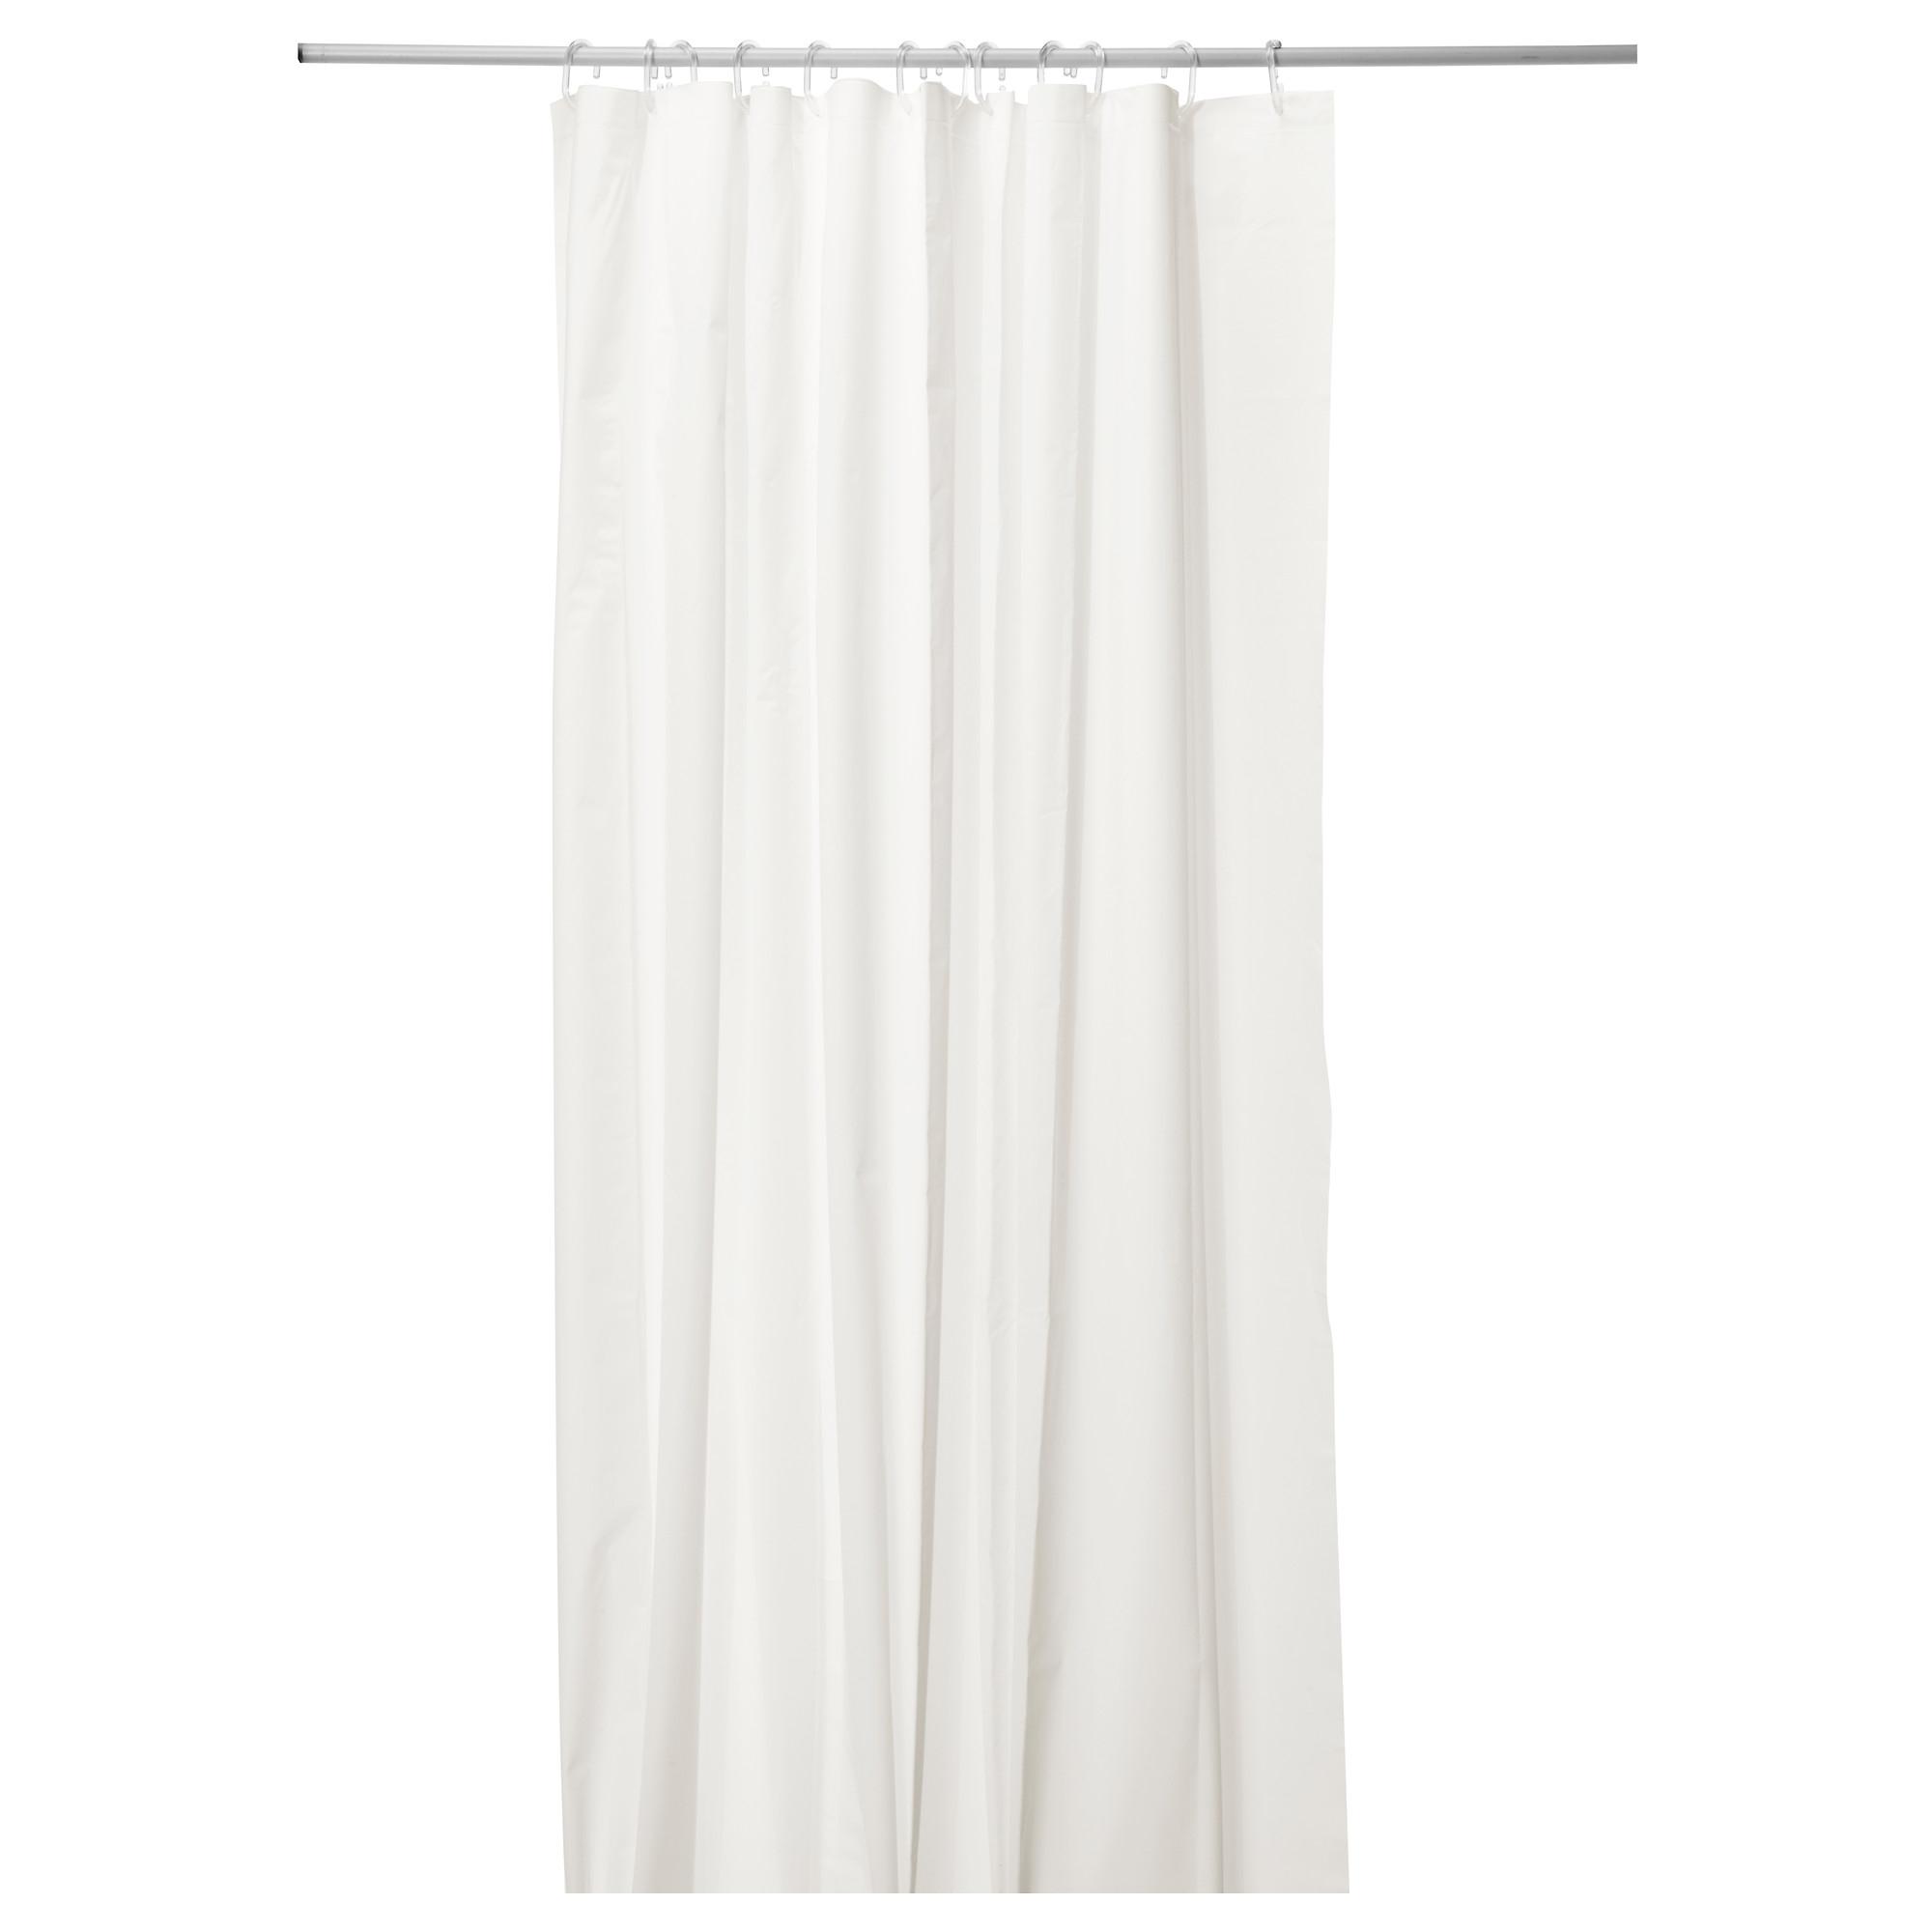 Eggegrund cortina ducha blanco - Cortina ducha ikea ...